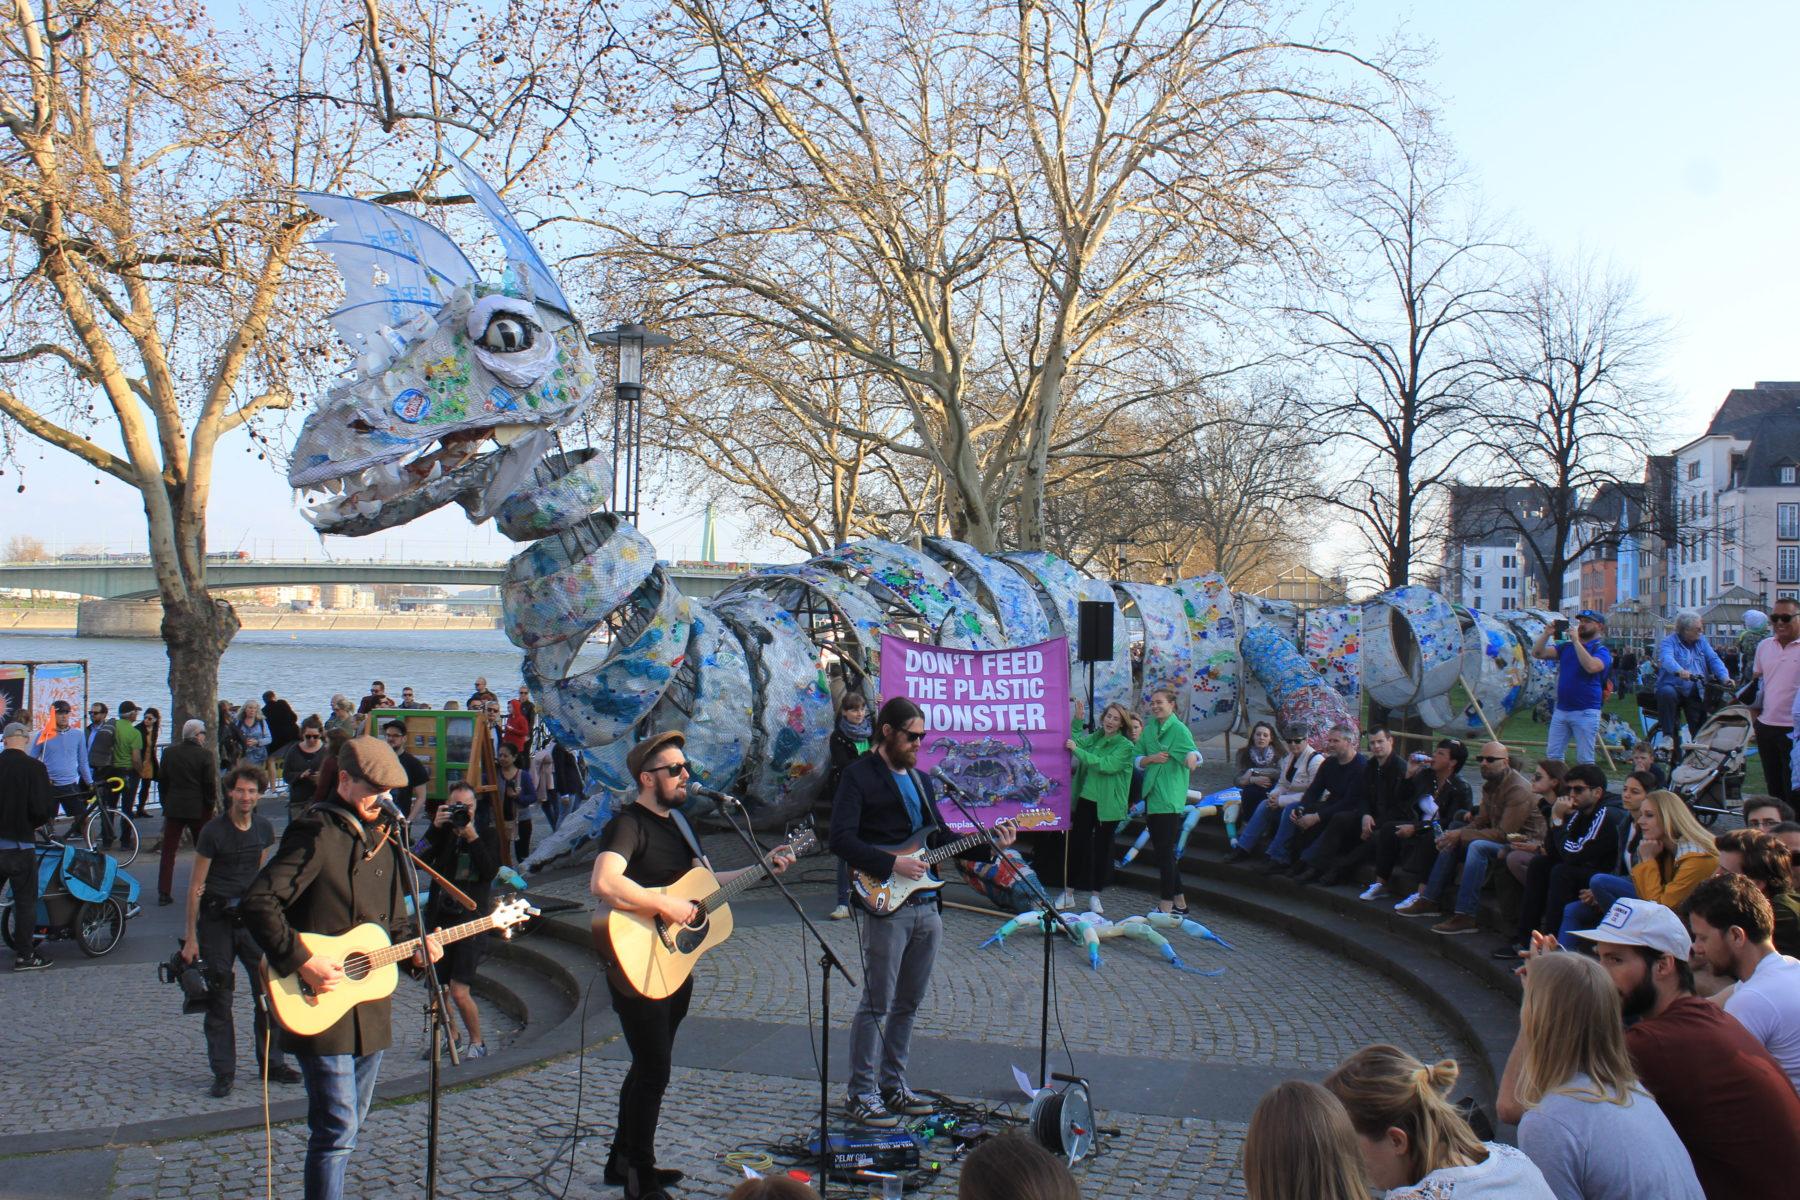 Break free from Plastic: International in Bewegung gegen Plastikverschmutzung - s